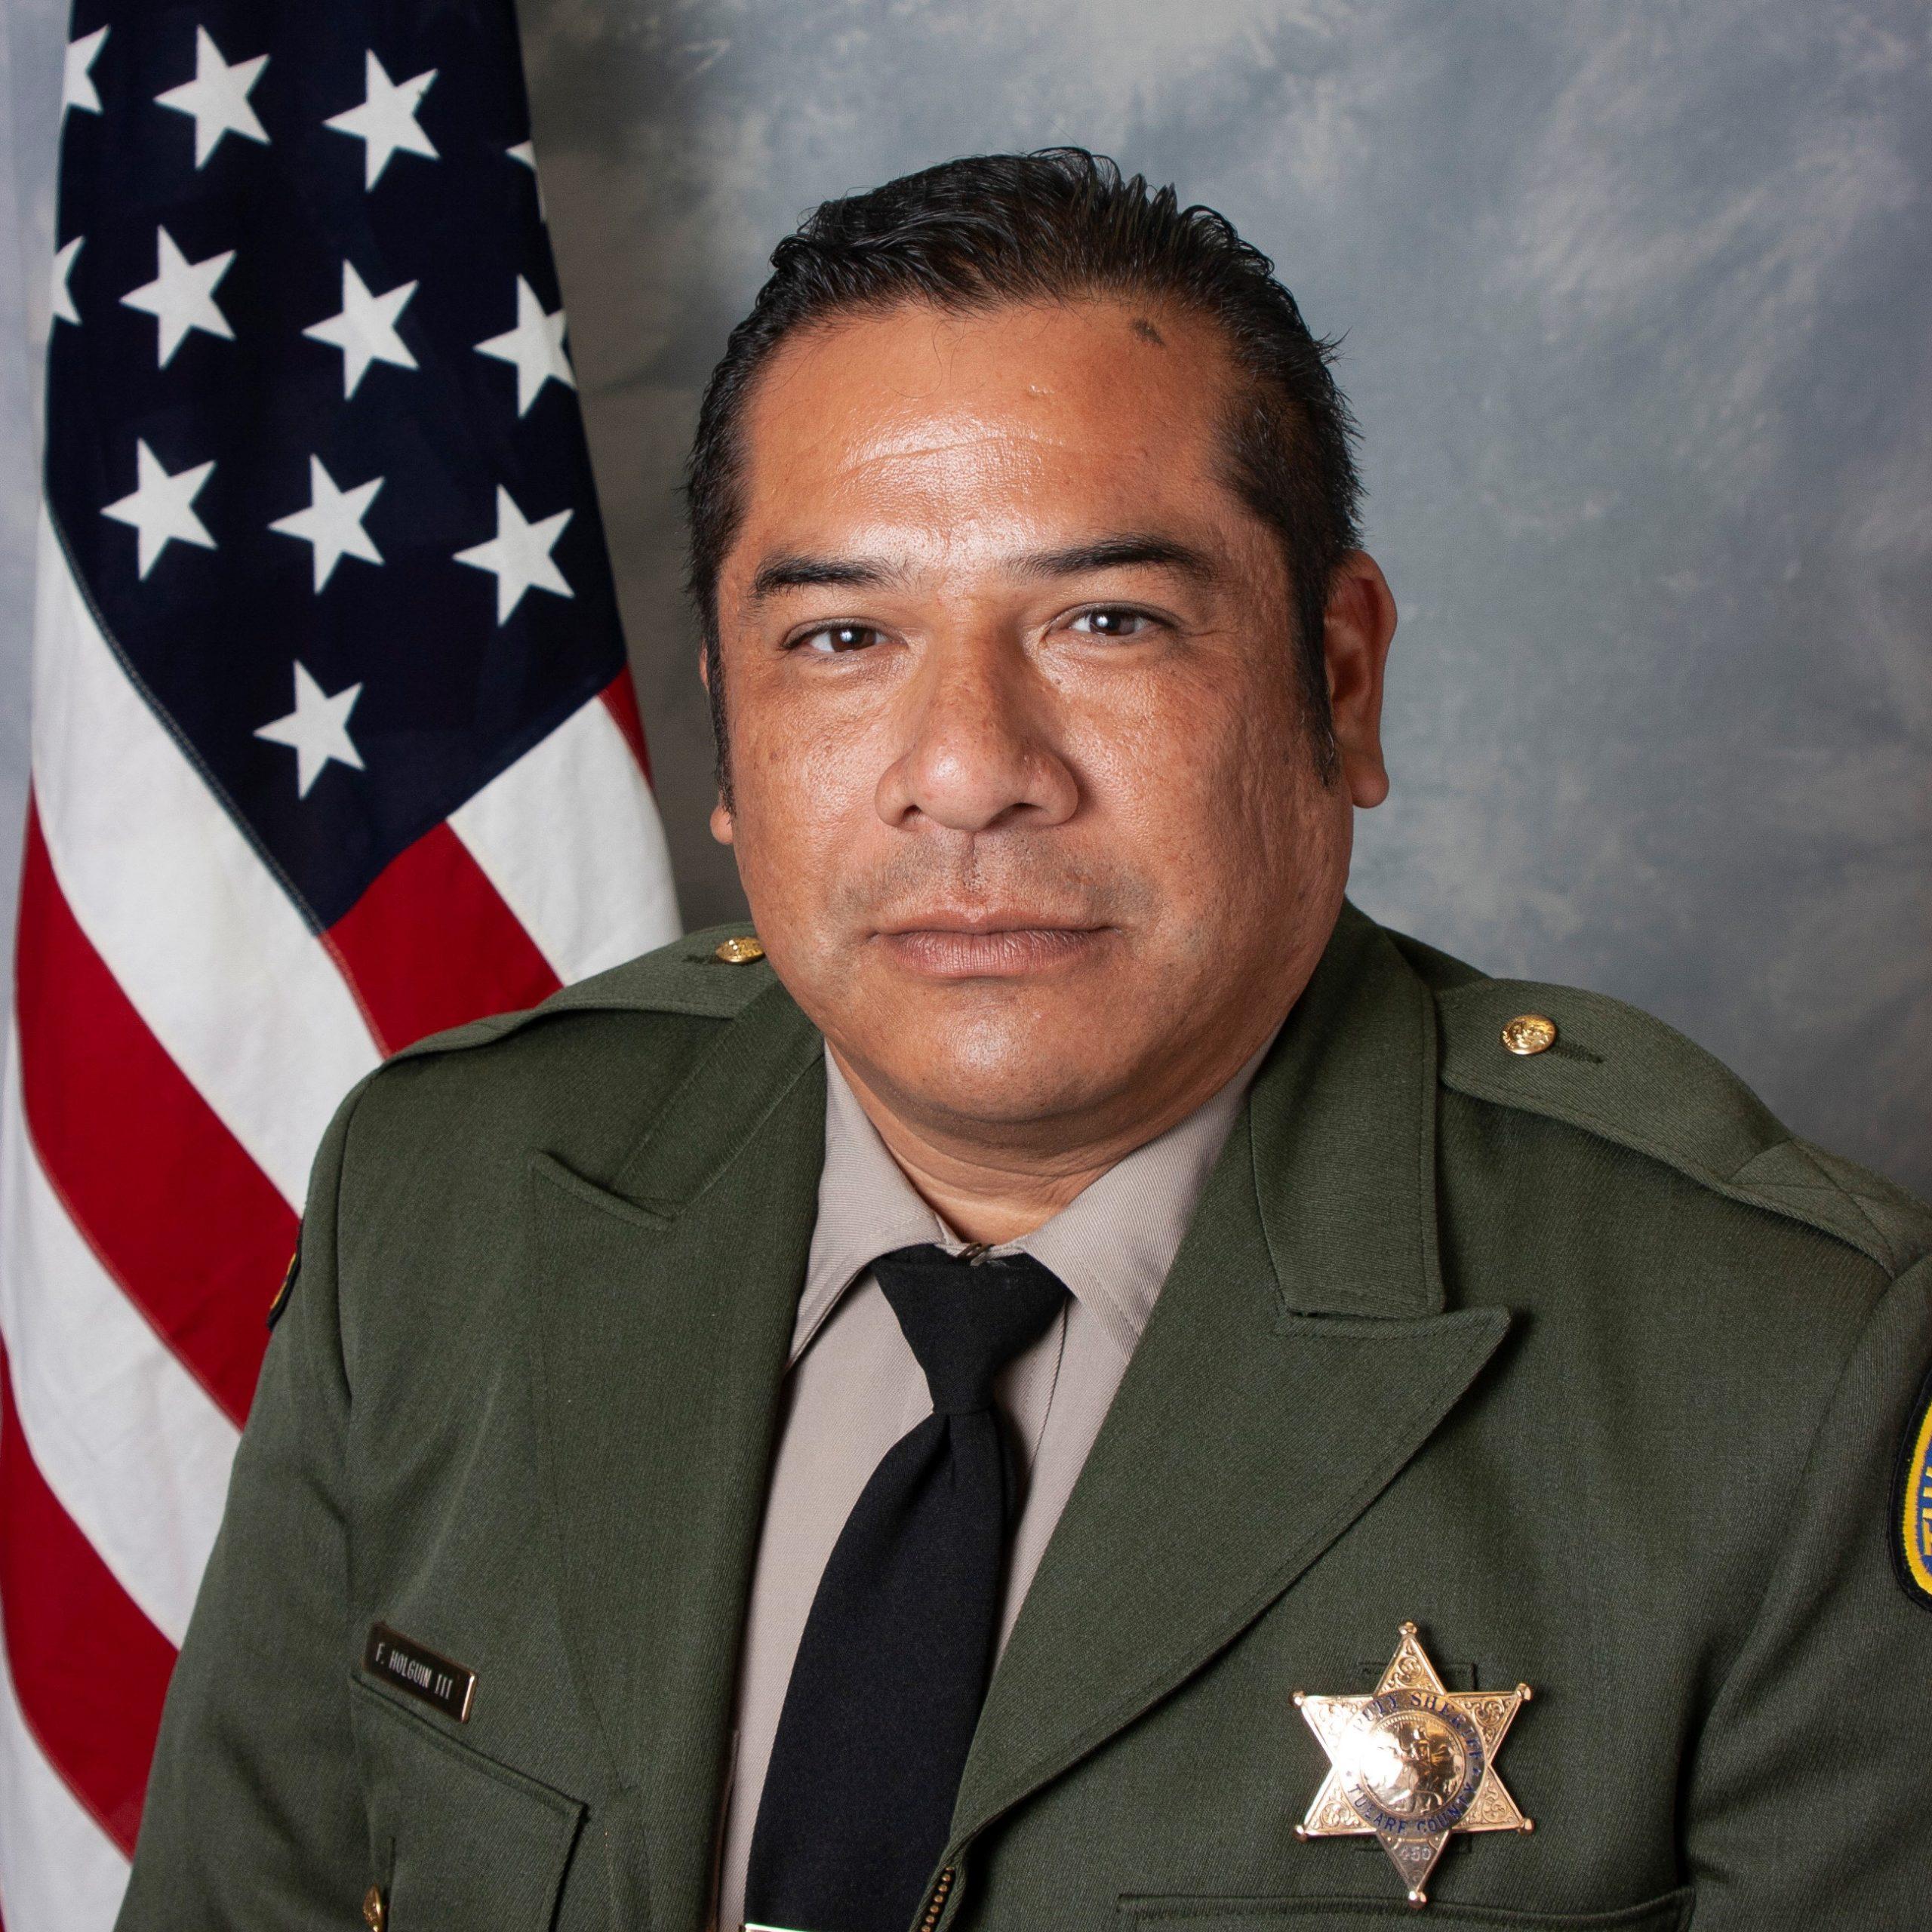 Deputy Sheriff II Frank Gonzalez Holguin, III | Tulare County Sheriff's Office, California